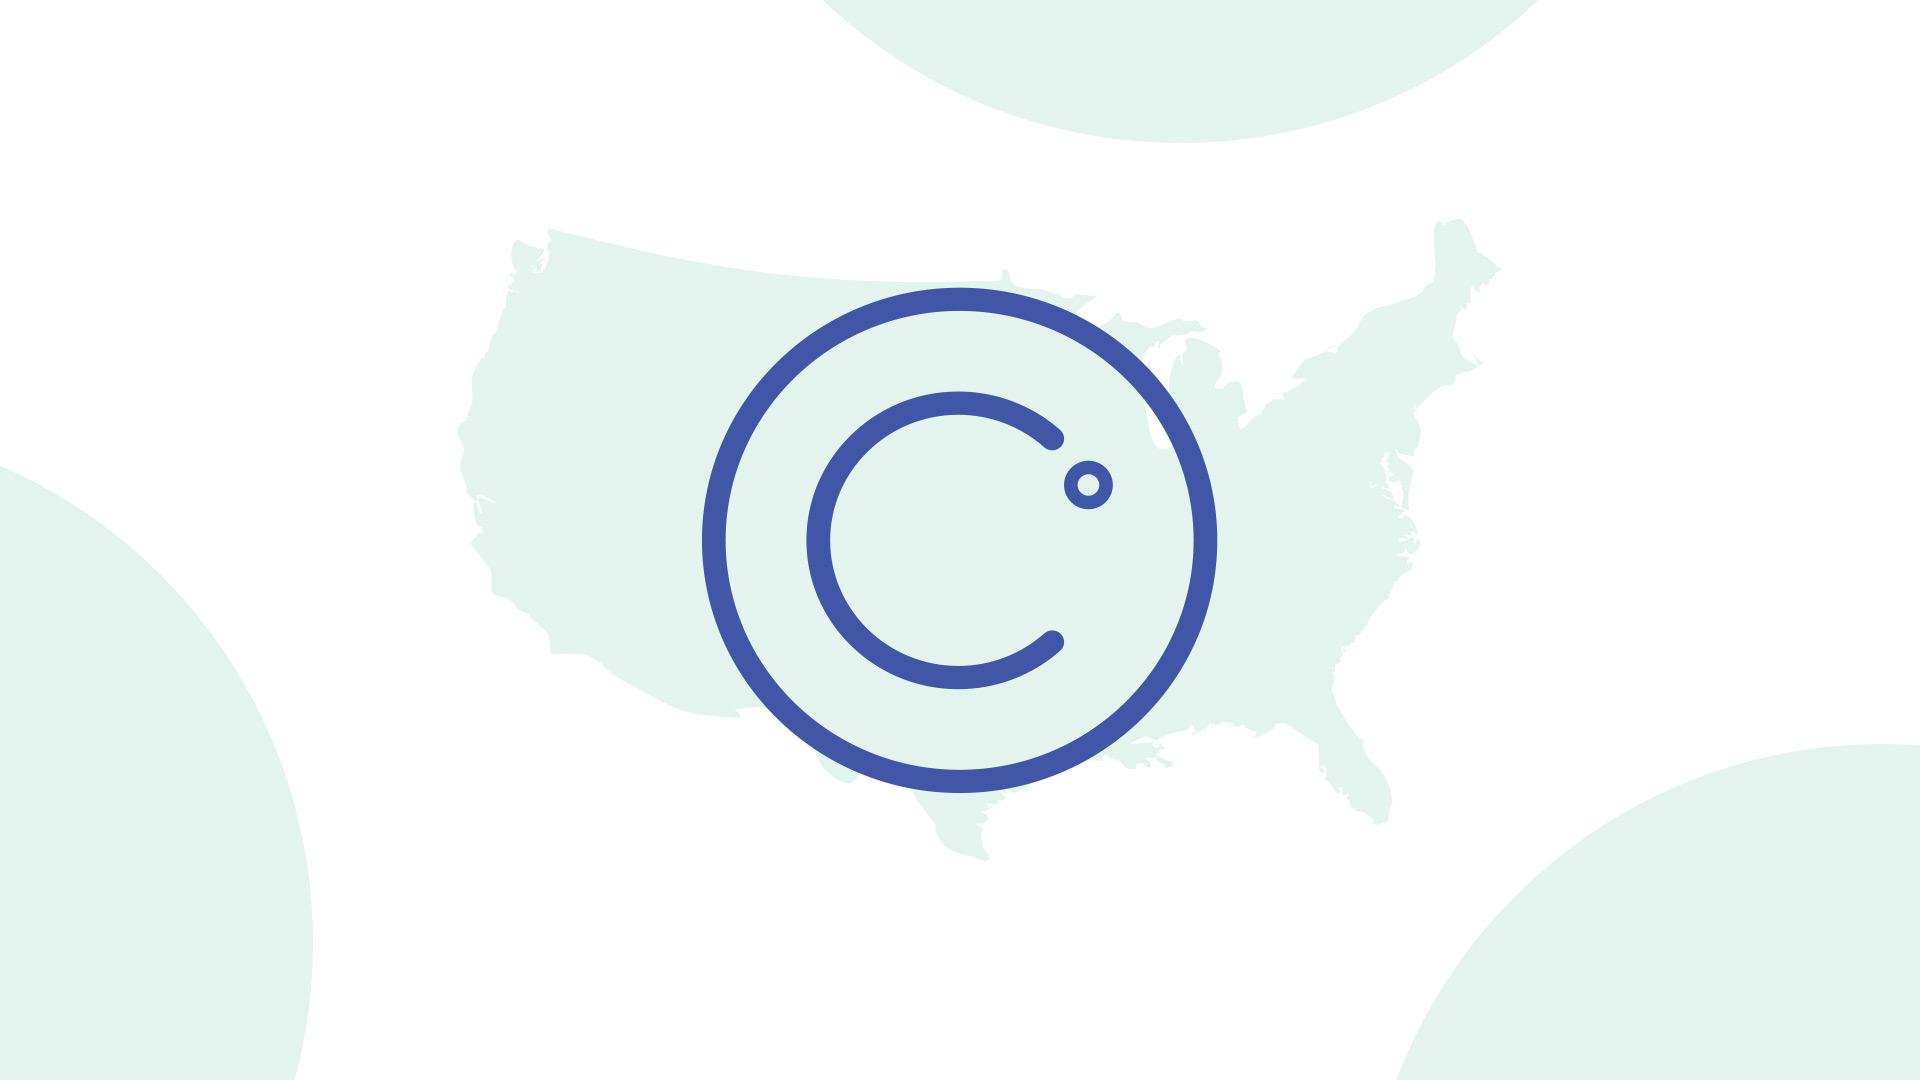 Alabama's securities regulator is also scrutinizing crypto lender Celsius